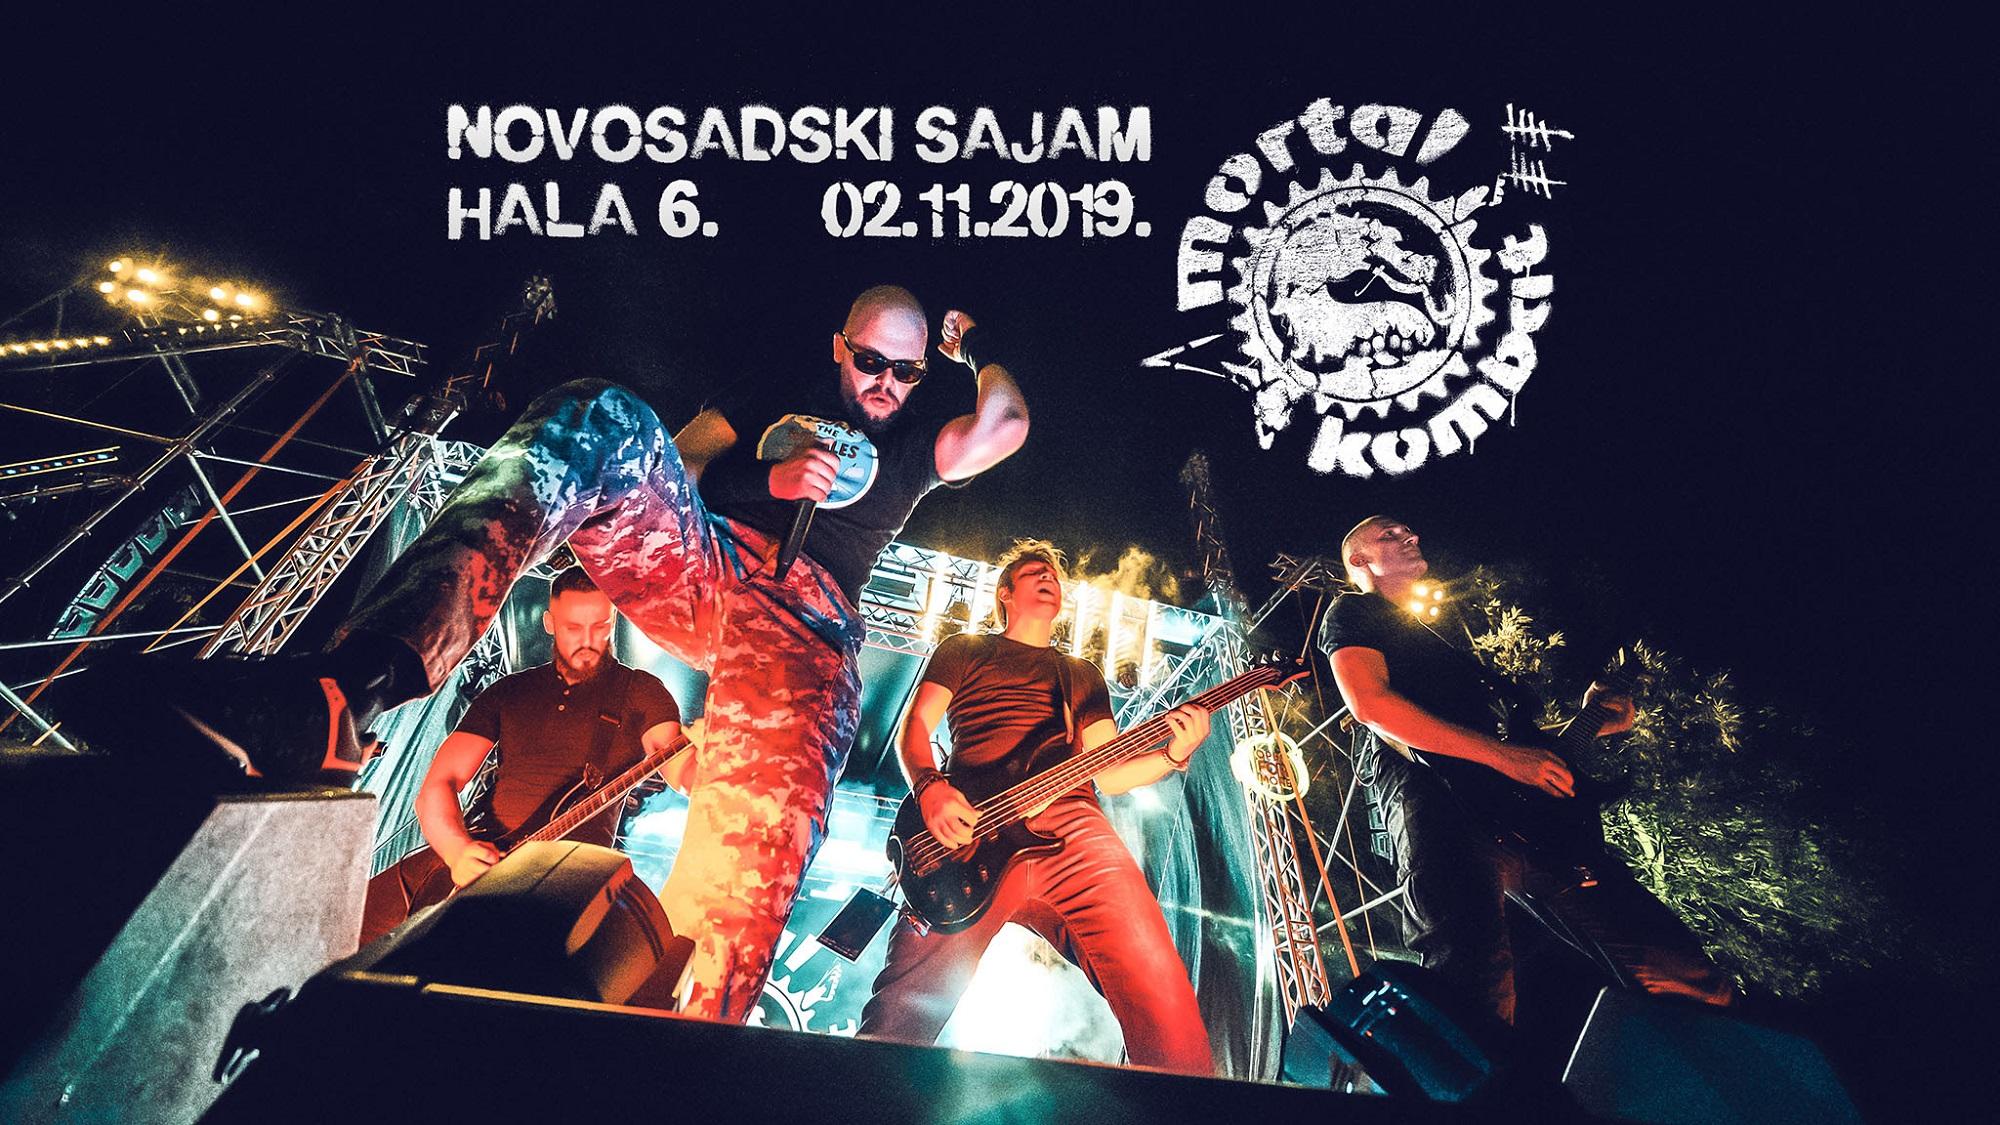 Mortal Kombat najavio veliki novosadski koncert DVD izdanjem